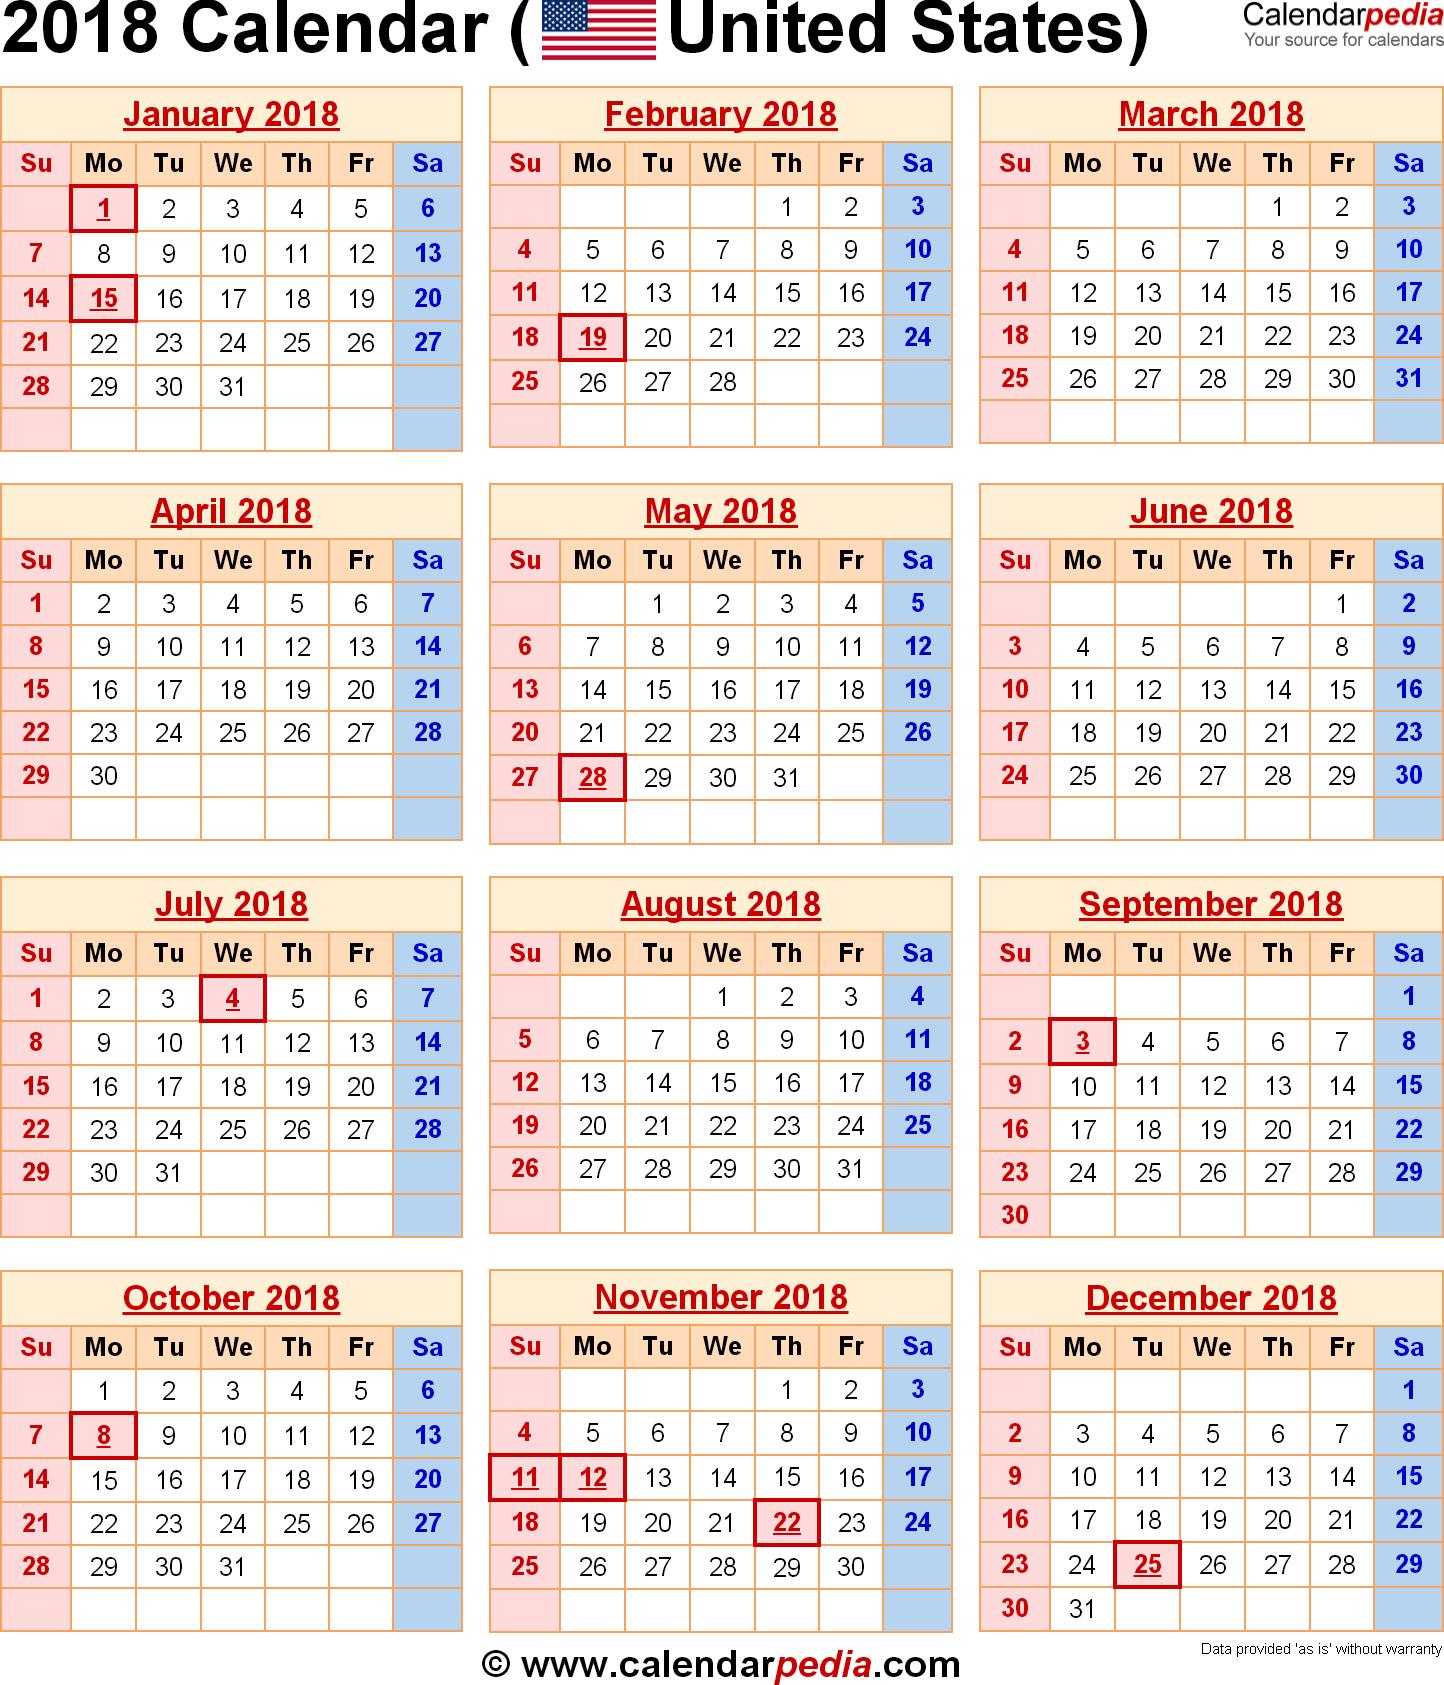 2018 Calendar | Calendars Diy | Holiday Calendar, 2018